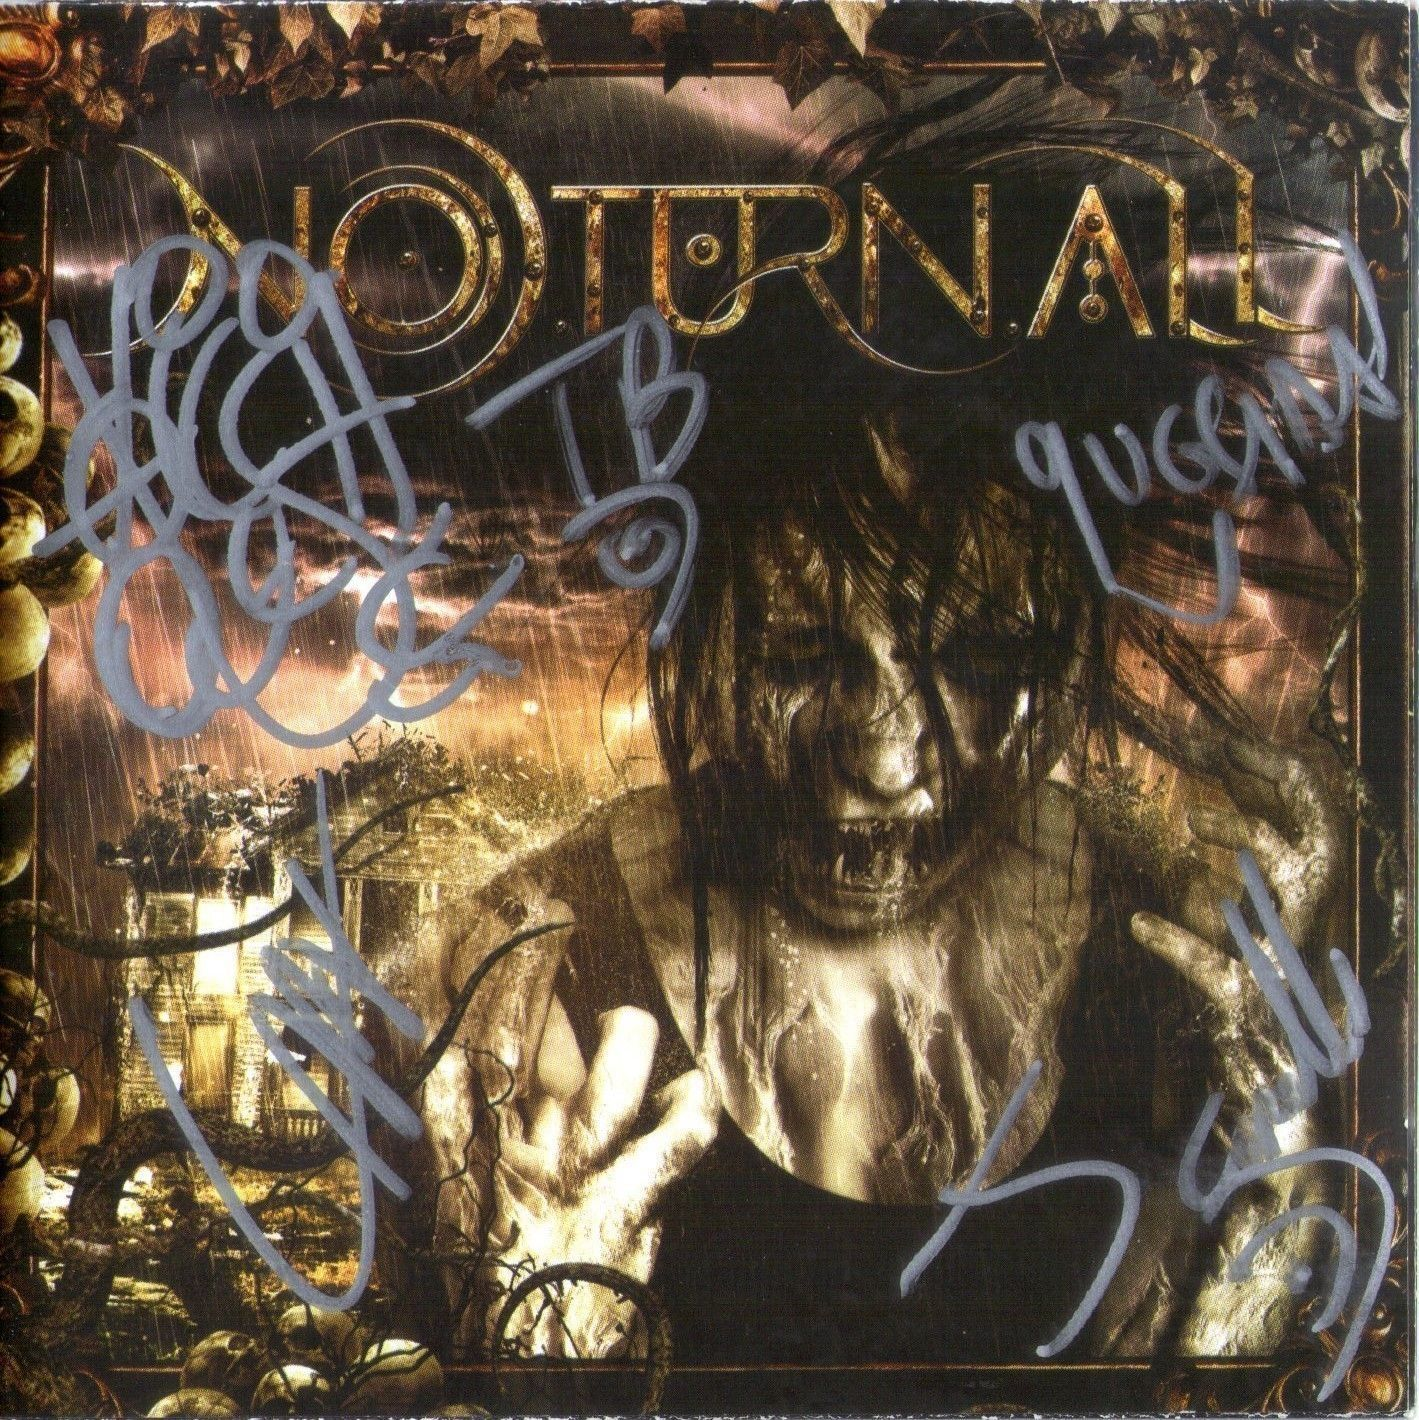 CD - Noturnall - Noturnall - Autografado